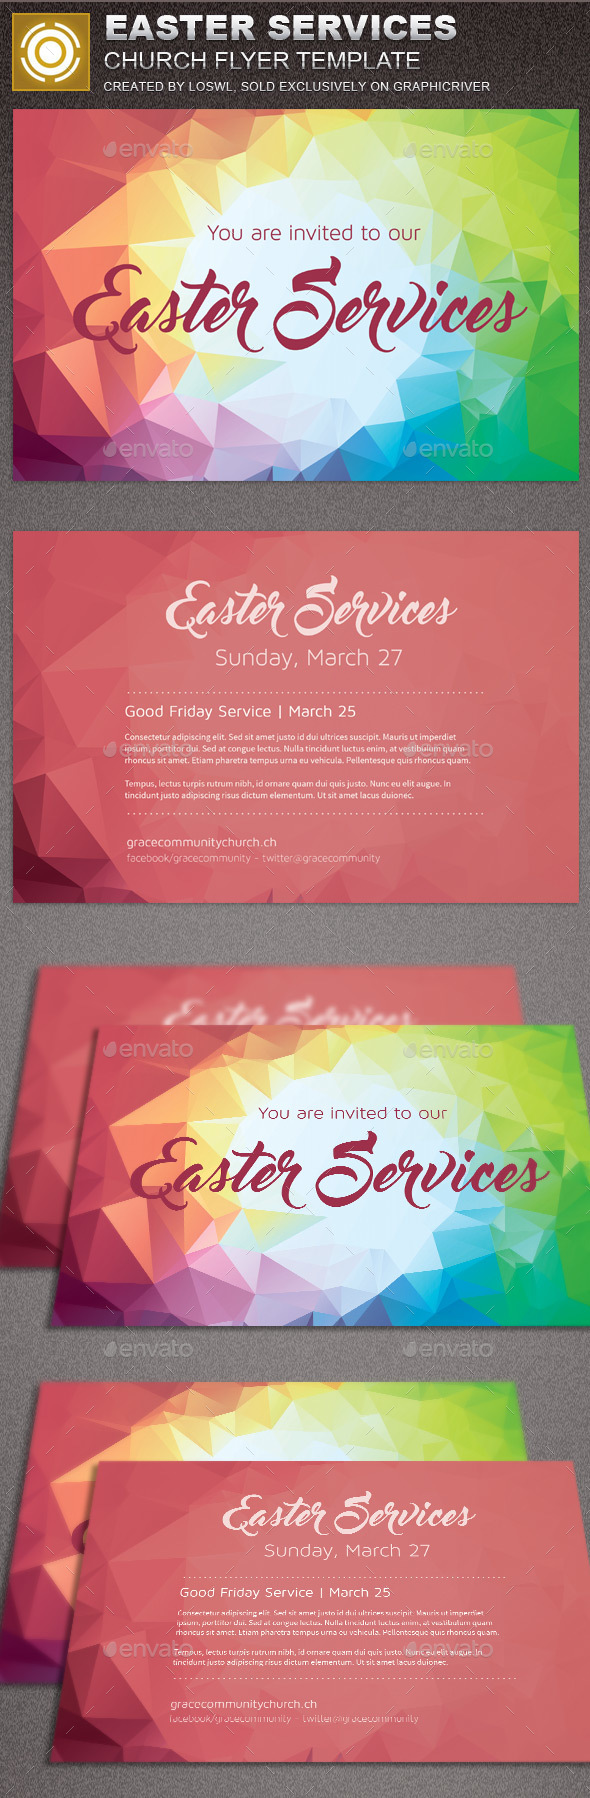 Easter Church Flyer Template - Church Flyers